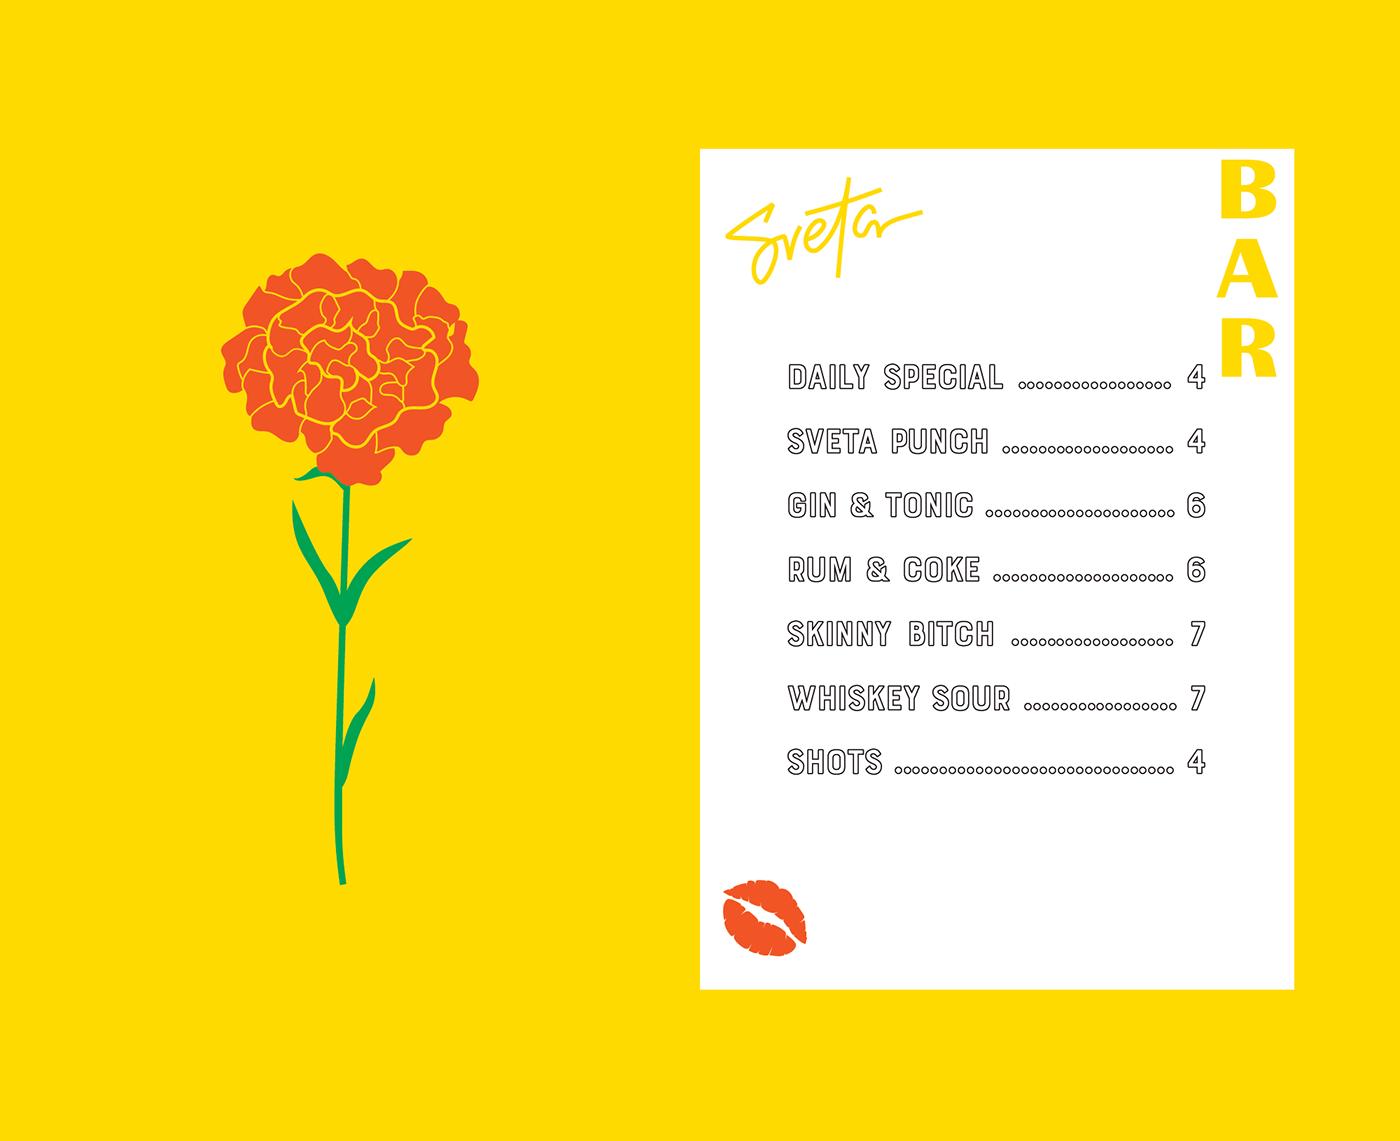 bar cafe Food  drink branding  logo graphic design  identity Estonia menu